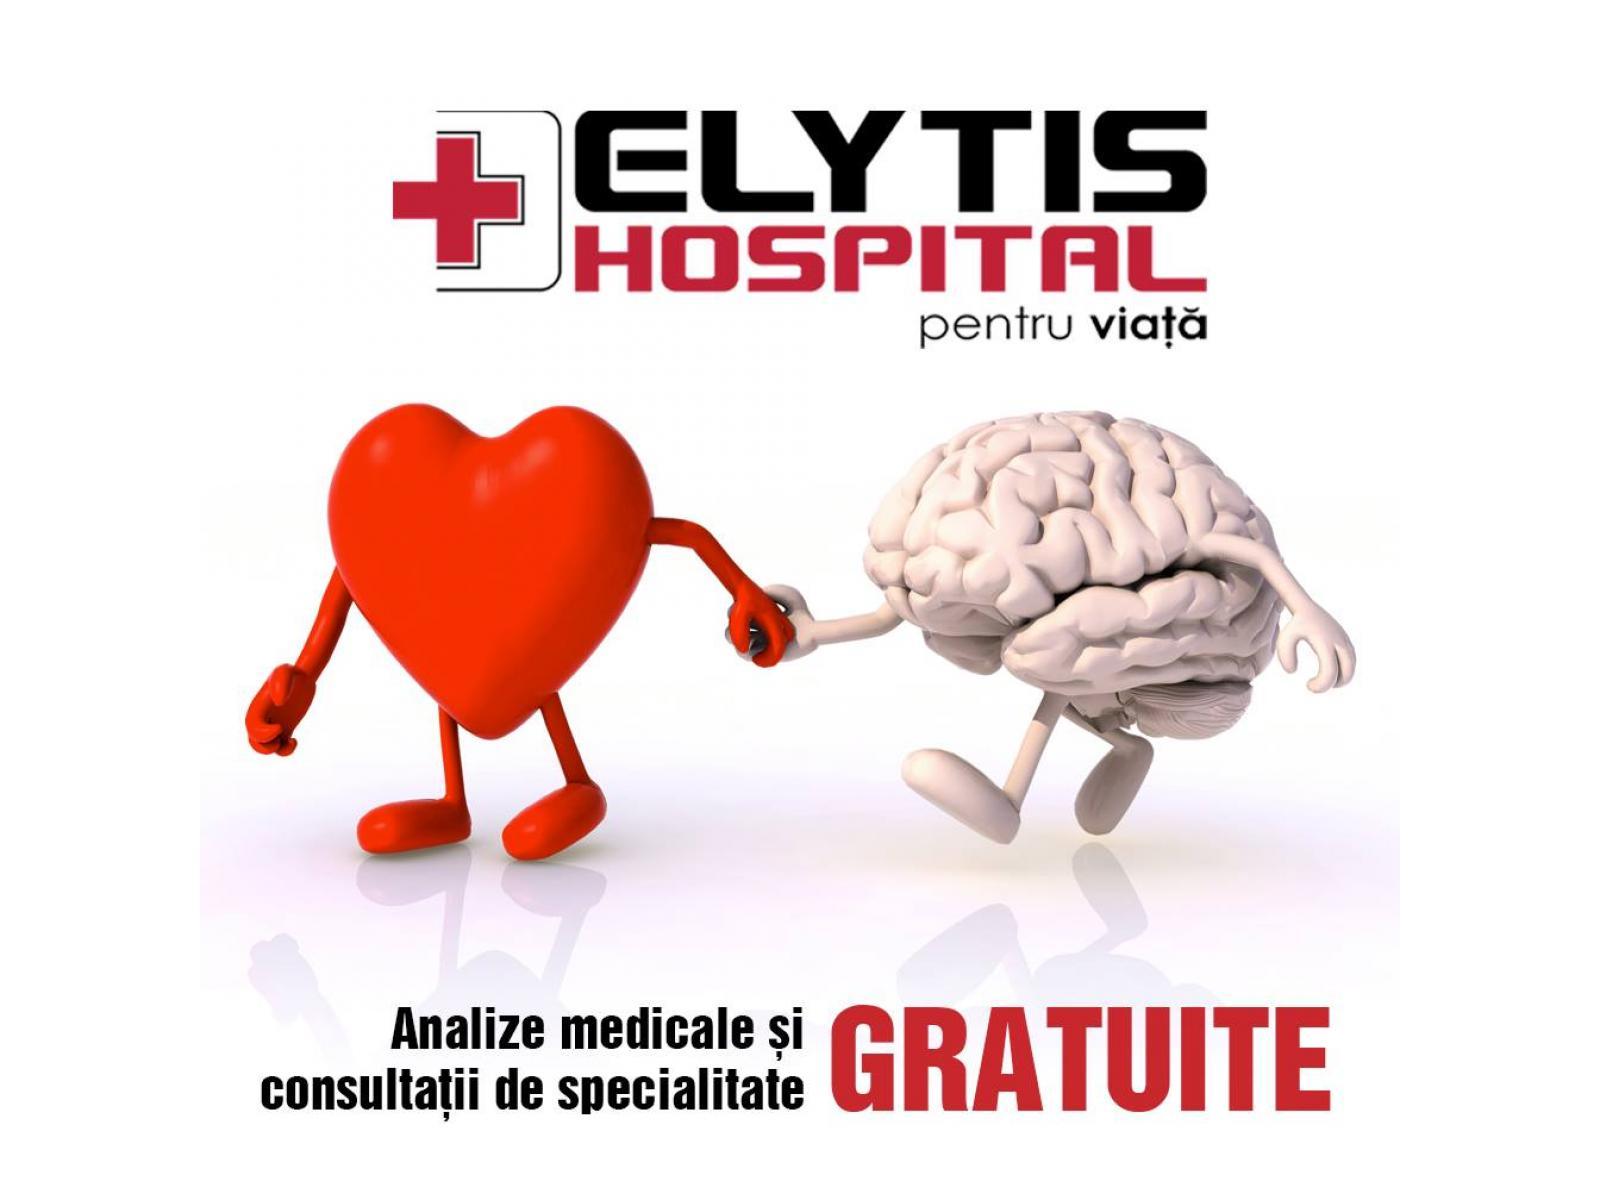 Elytis Hospital - 10999361_449249878565575_82981659636776743_o.jpg